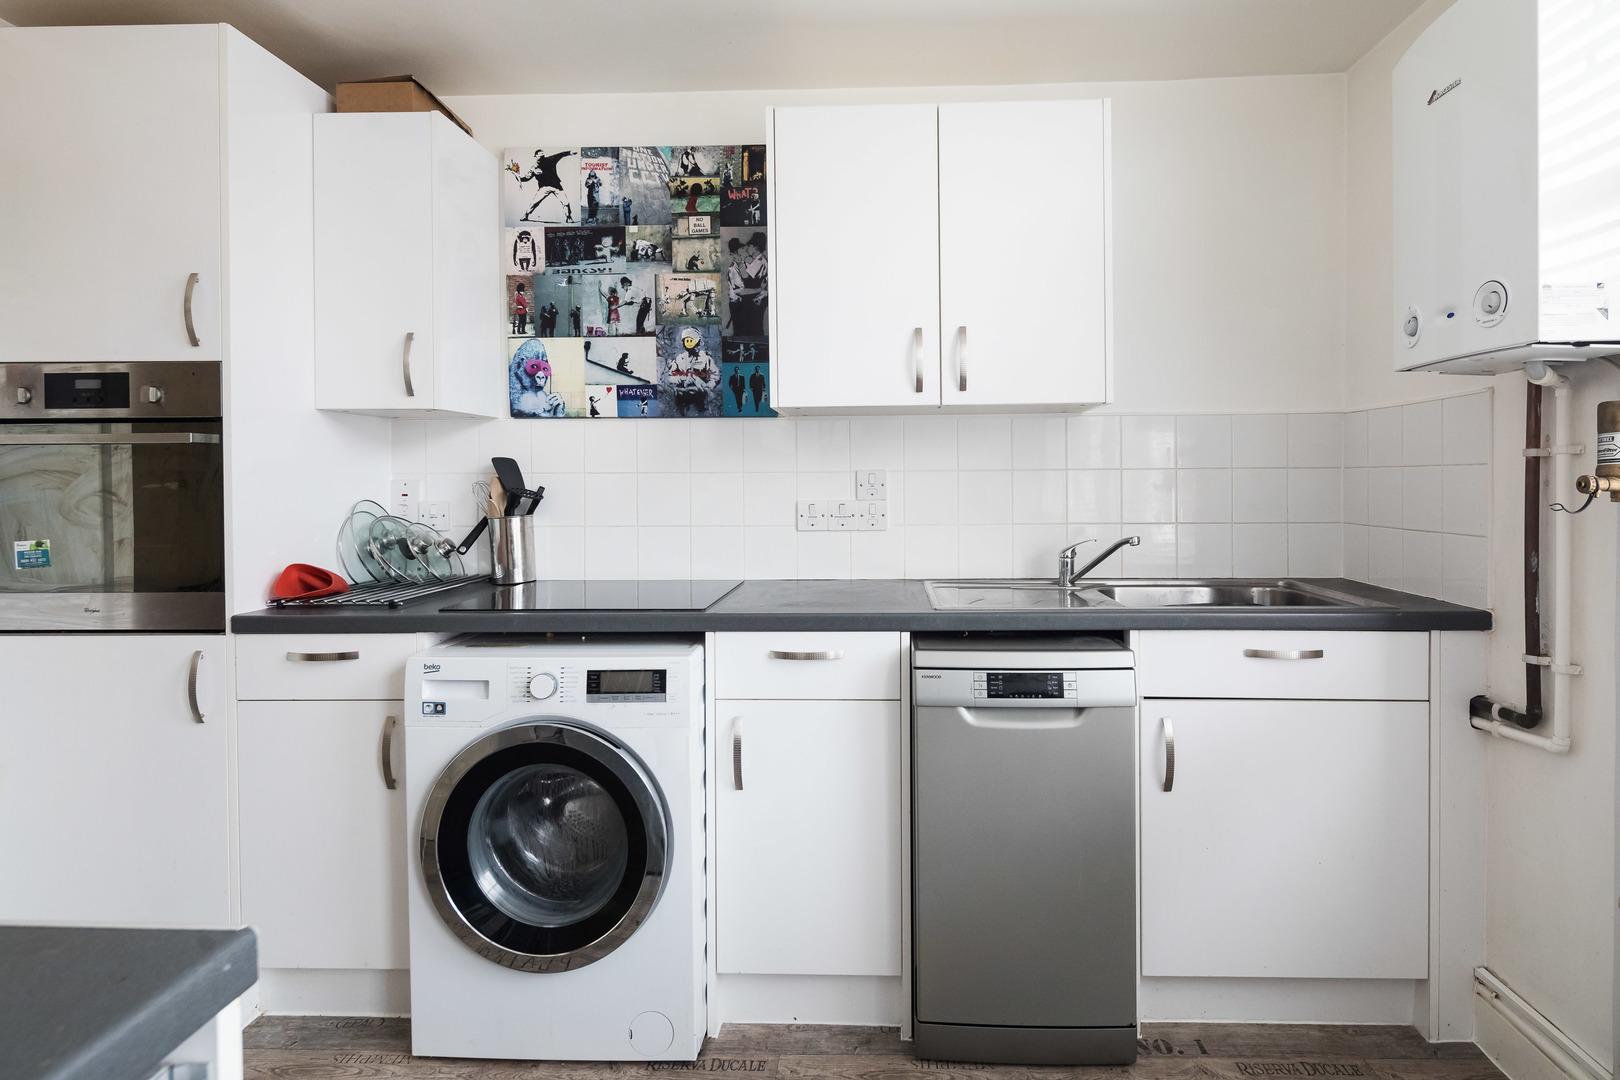 Bloomsbury Square - 2 Bed Apartment in Bloomsbury • Veeve